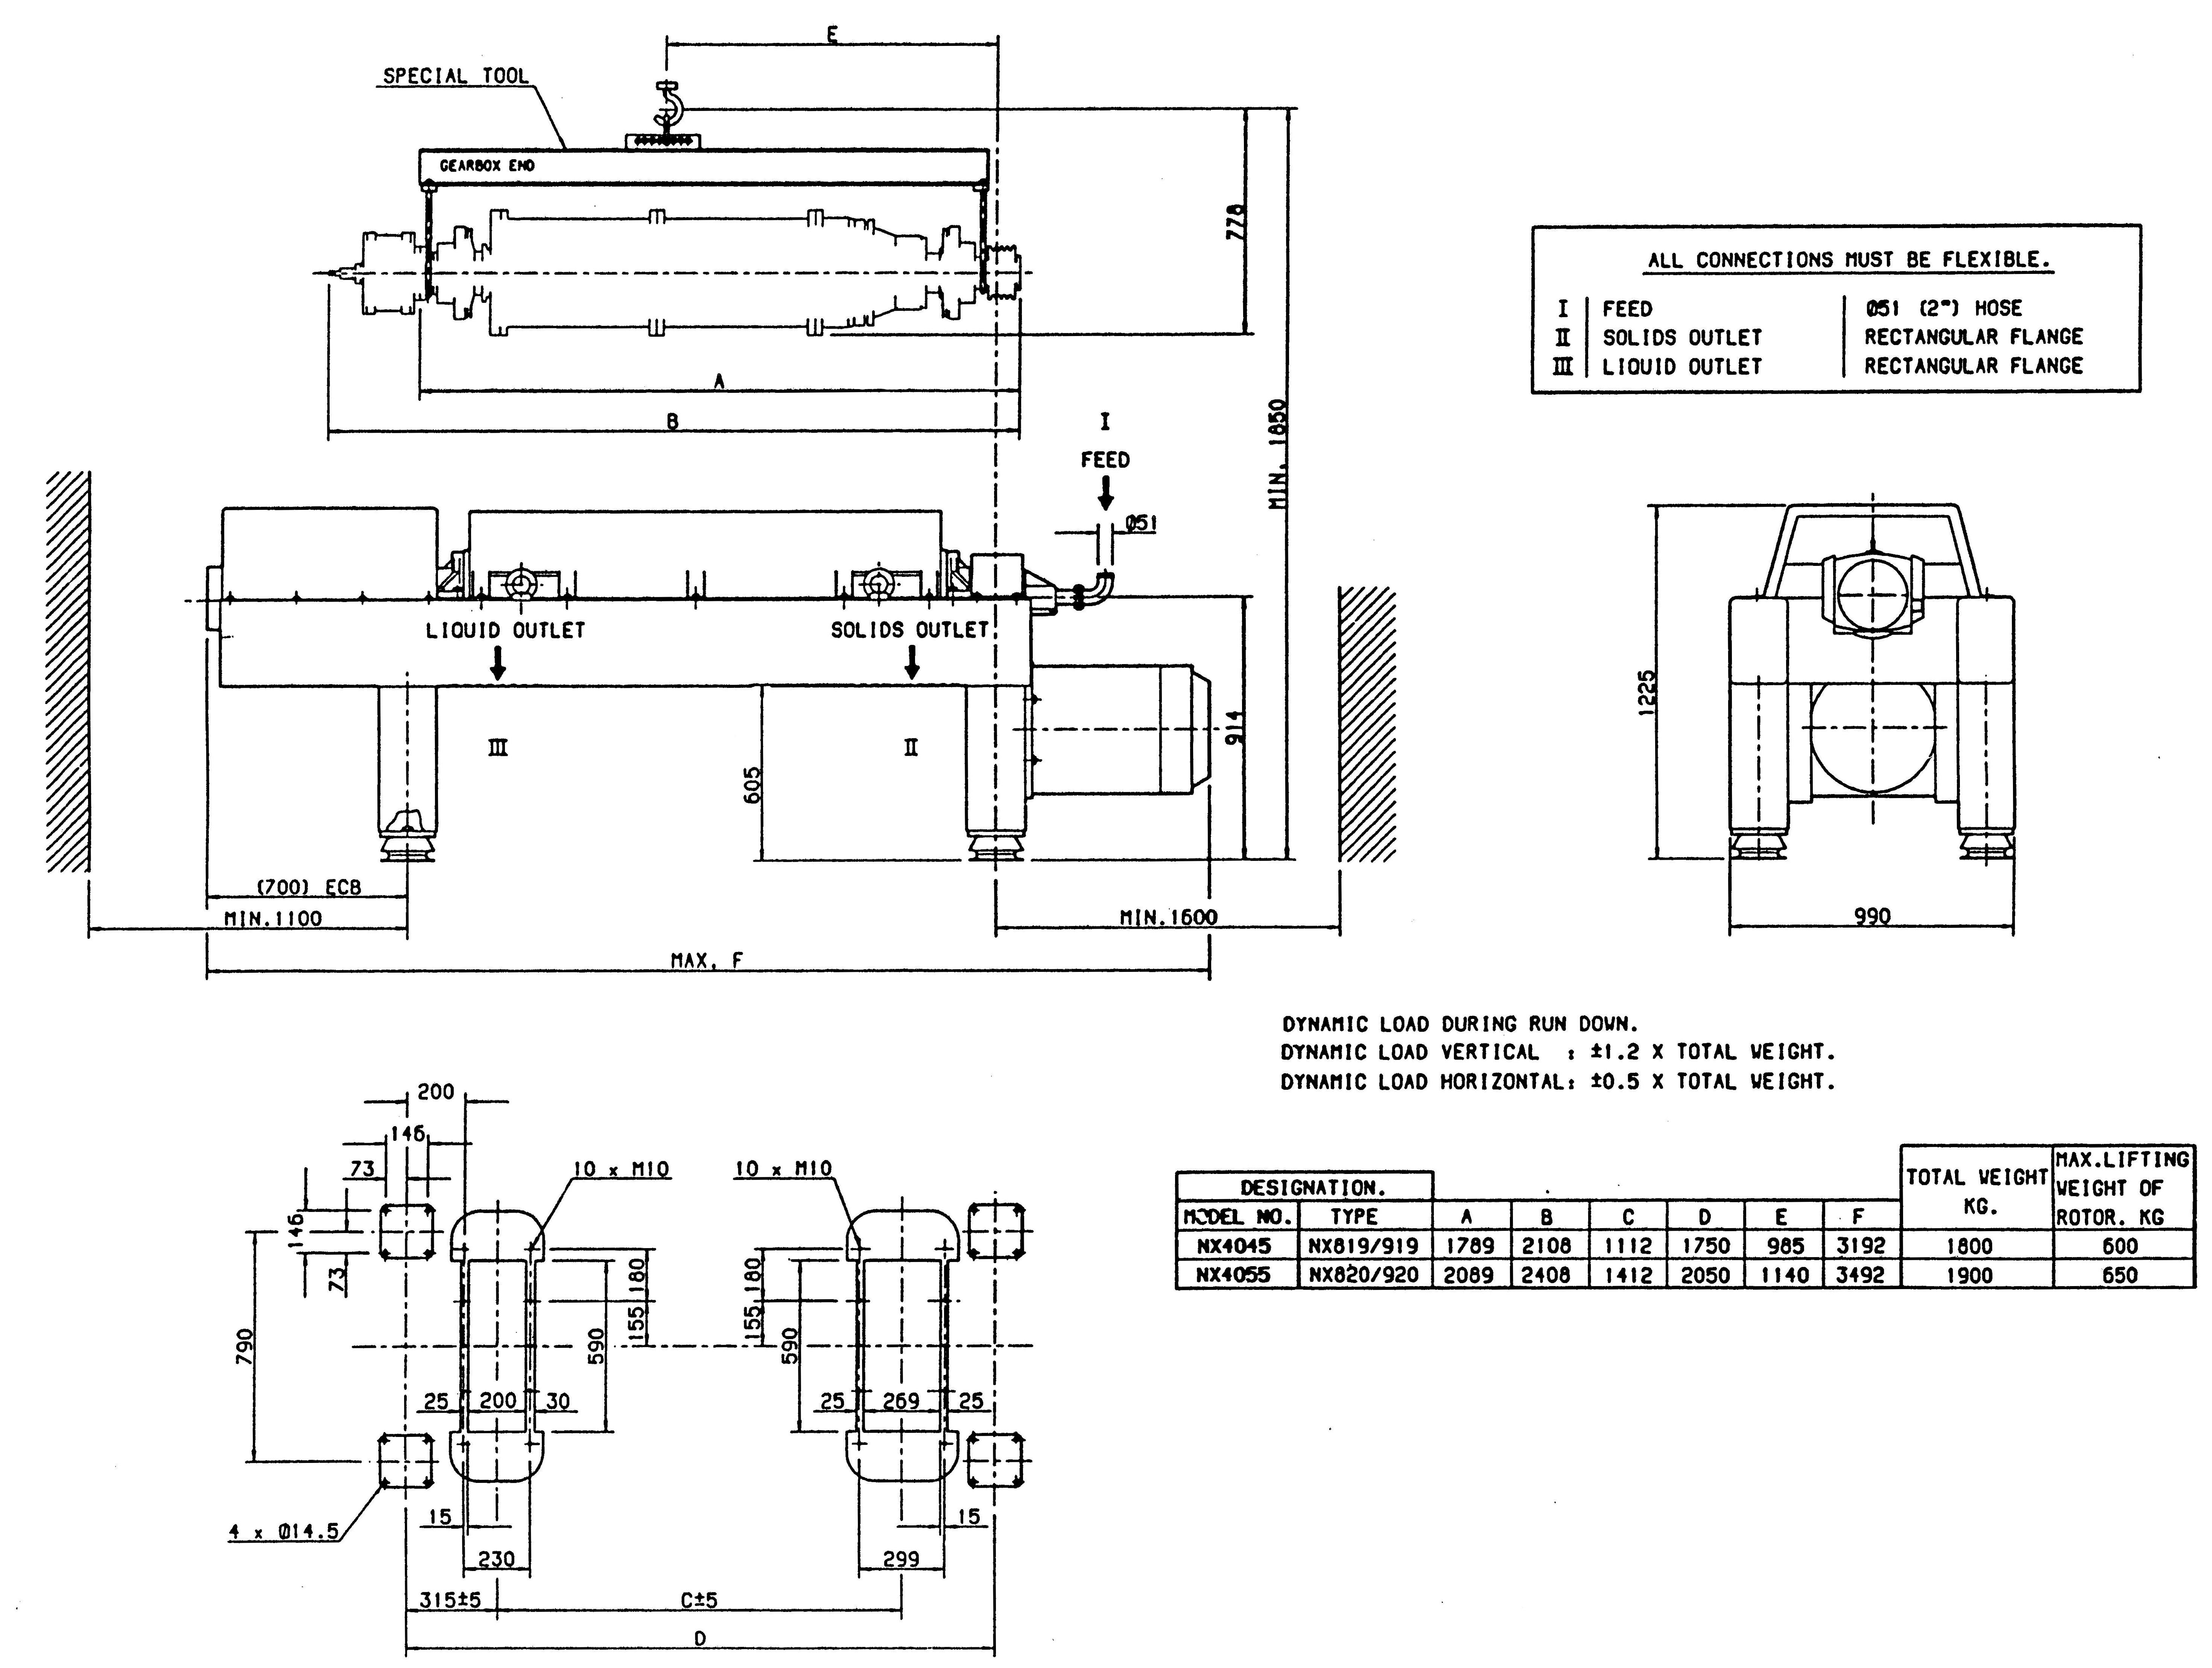 alfa laval decanter centrifuge model avnx 4055 p40221031_14 alfa laval avnx 4055 centrifuge centrifuge separator exapro  at eliteediting.co